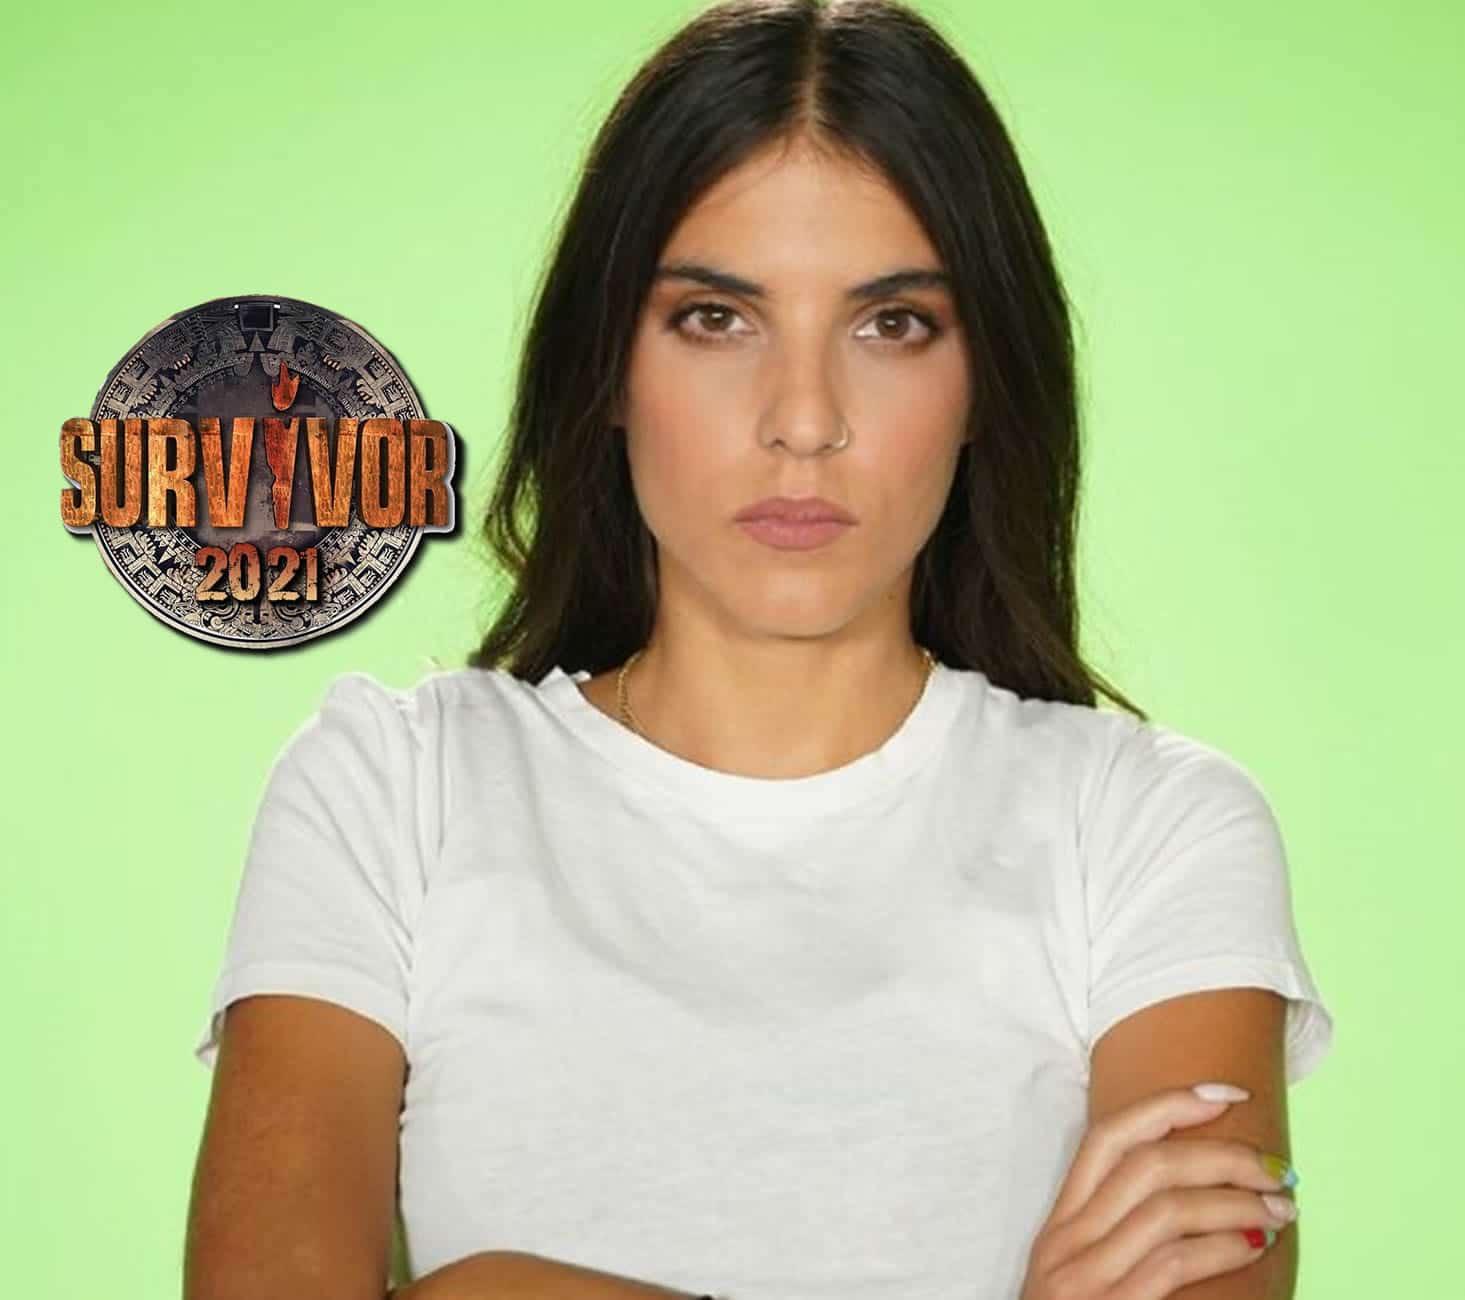 Survivor 2021 Άννα Μαρία Βέλλη